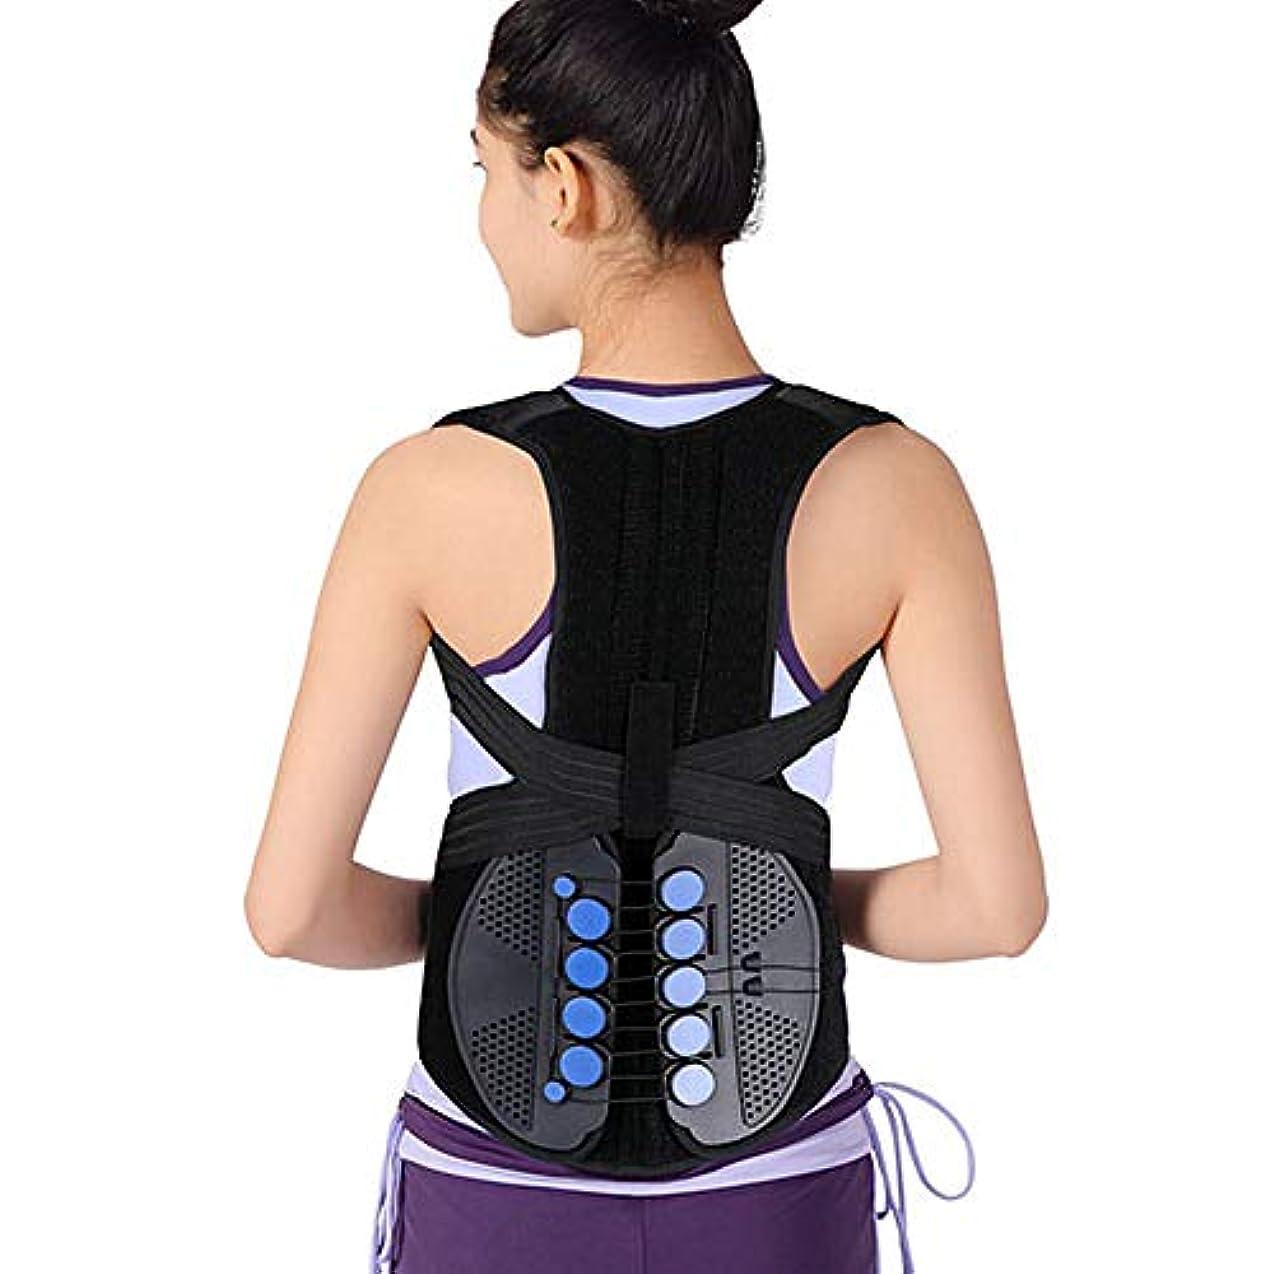 LINGYAO 背部アライナー調節可能な滑車通気性の快適さの緩和の痛みの姿勢の支柱が付いている省力化の訂正